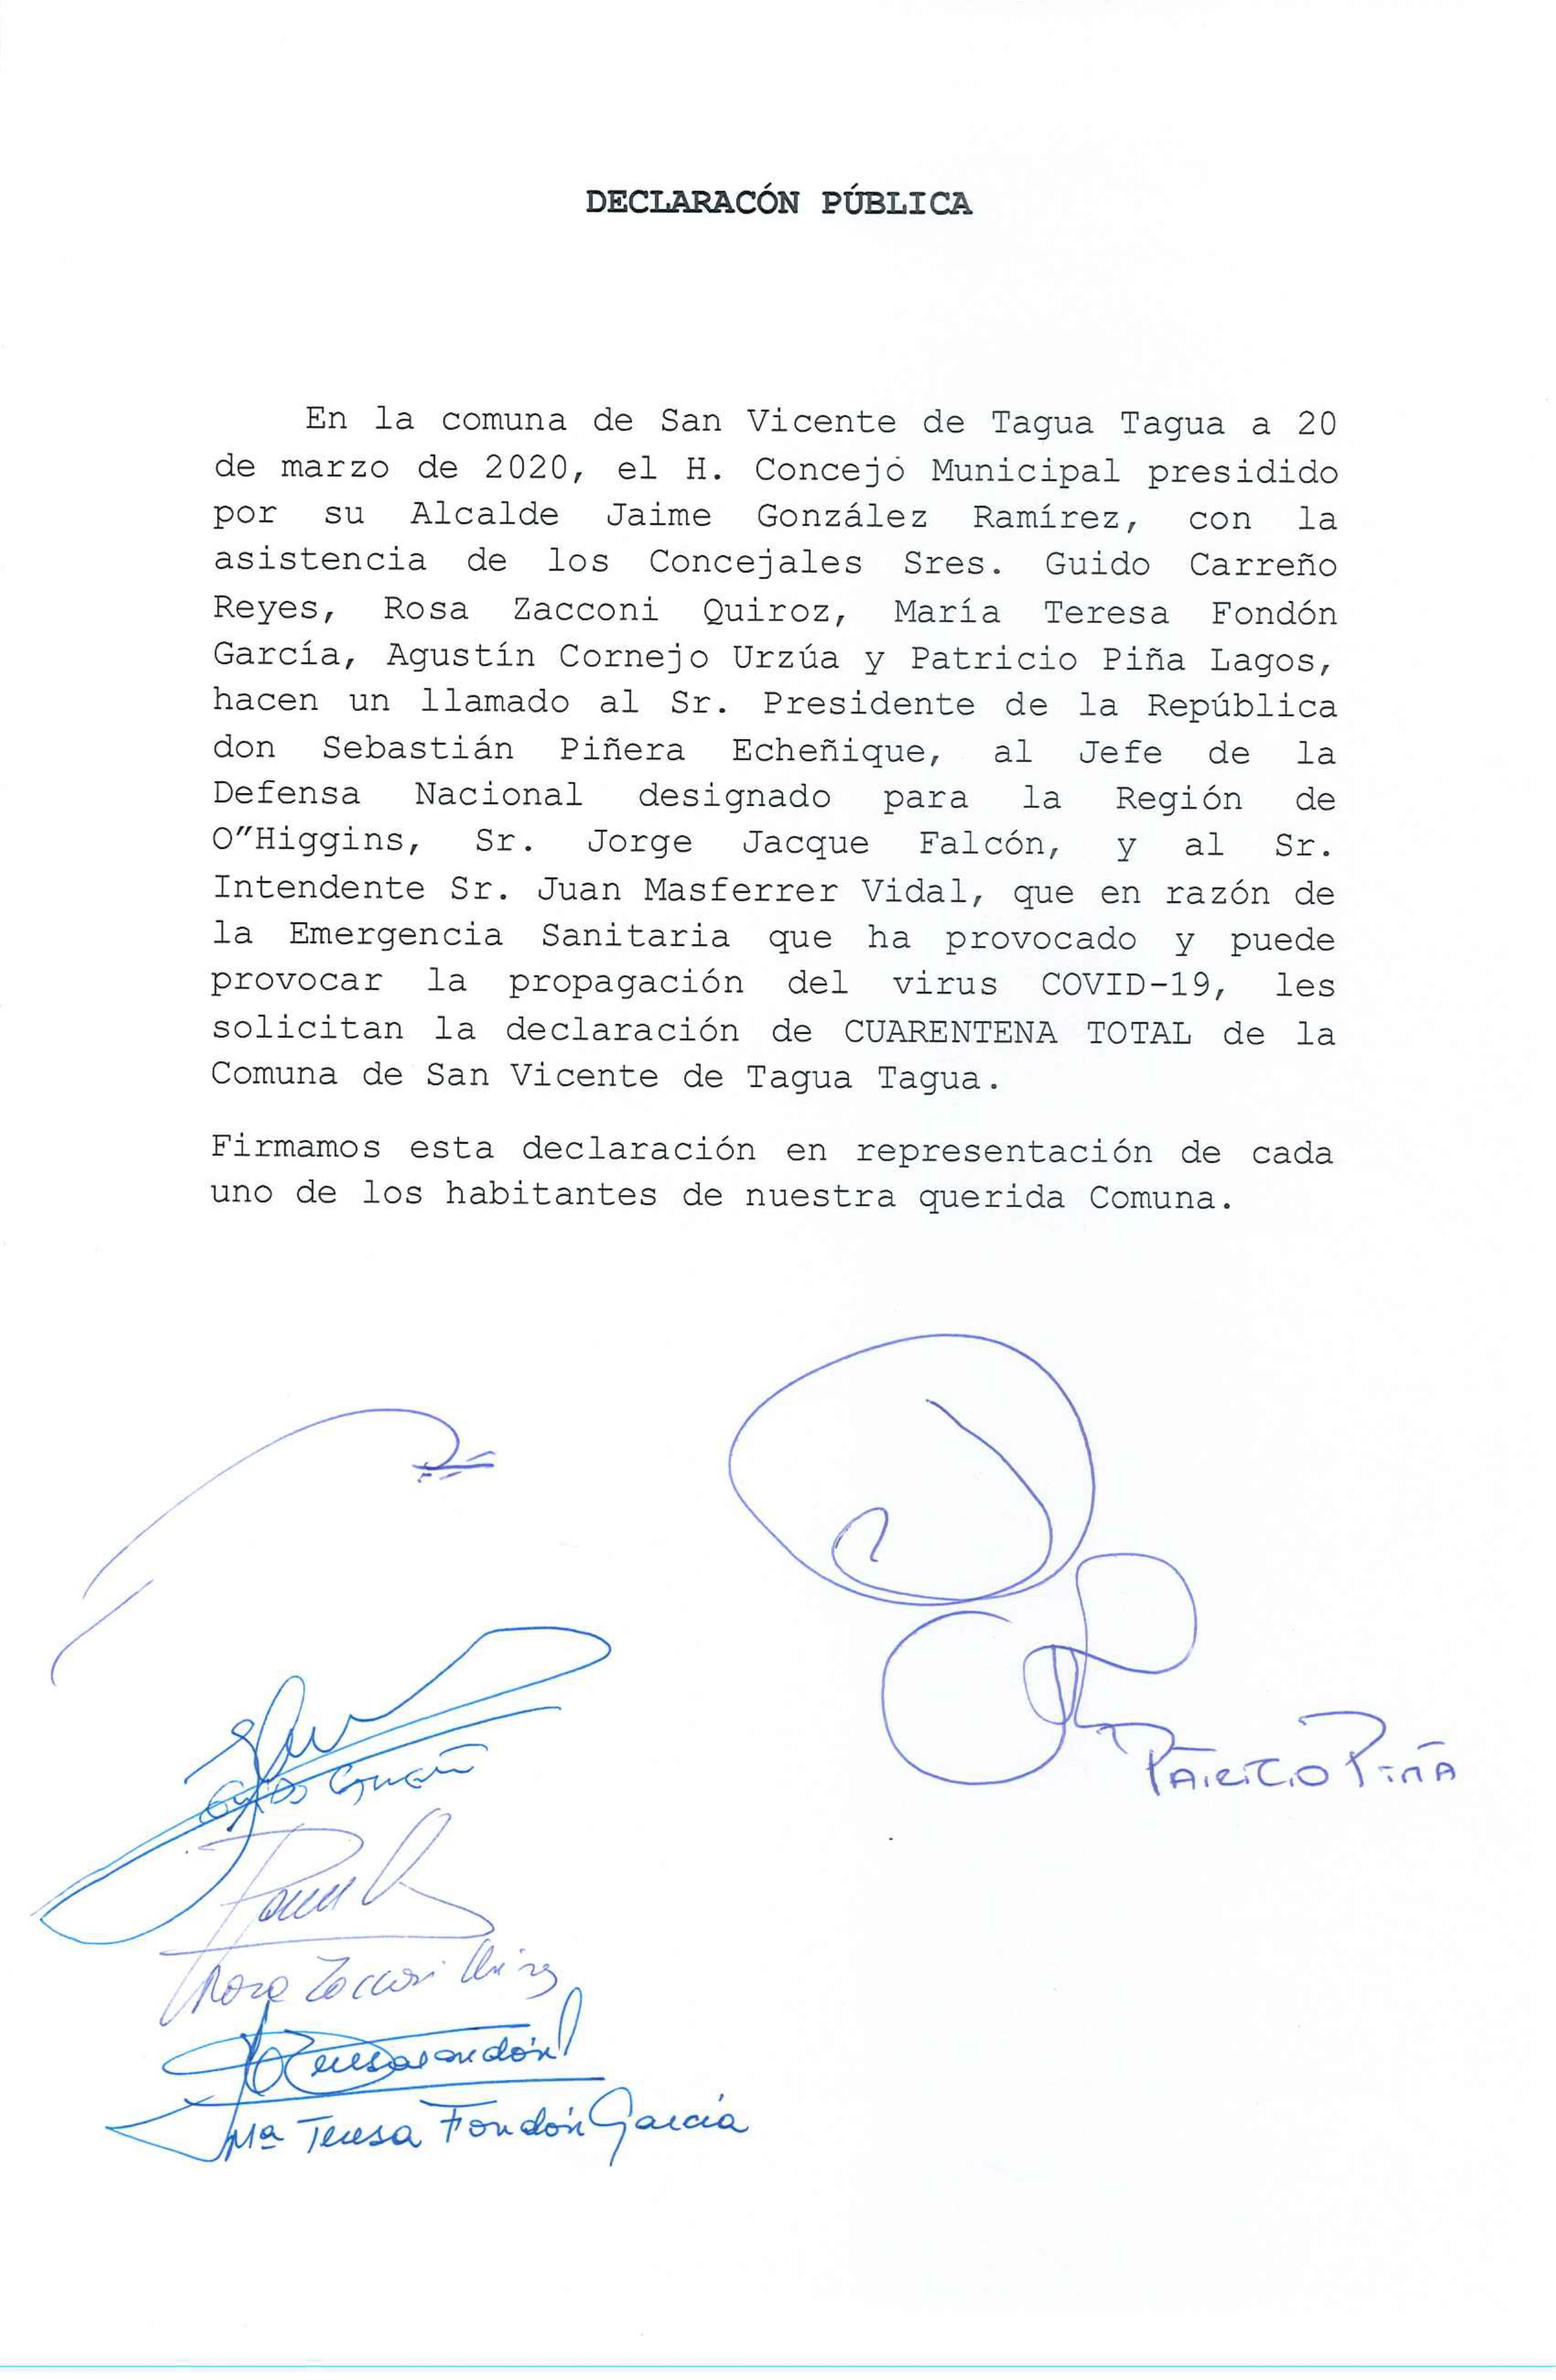 EL ALCALDE JAIME GONZÁLEZ JUNTO A LOS CONCEJALES HAN SOLICITADO AL JEFE DE DEFENSA NACIONAL REGIÓN DE O'HIGGINS, JORGE JACQUE, DECRETAR CUARENTENA TOTAL PARA LA COMUNA DE SAN VICENTE DE TAGUA TAGUA